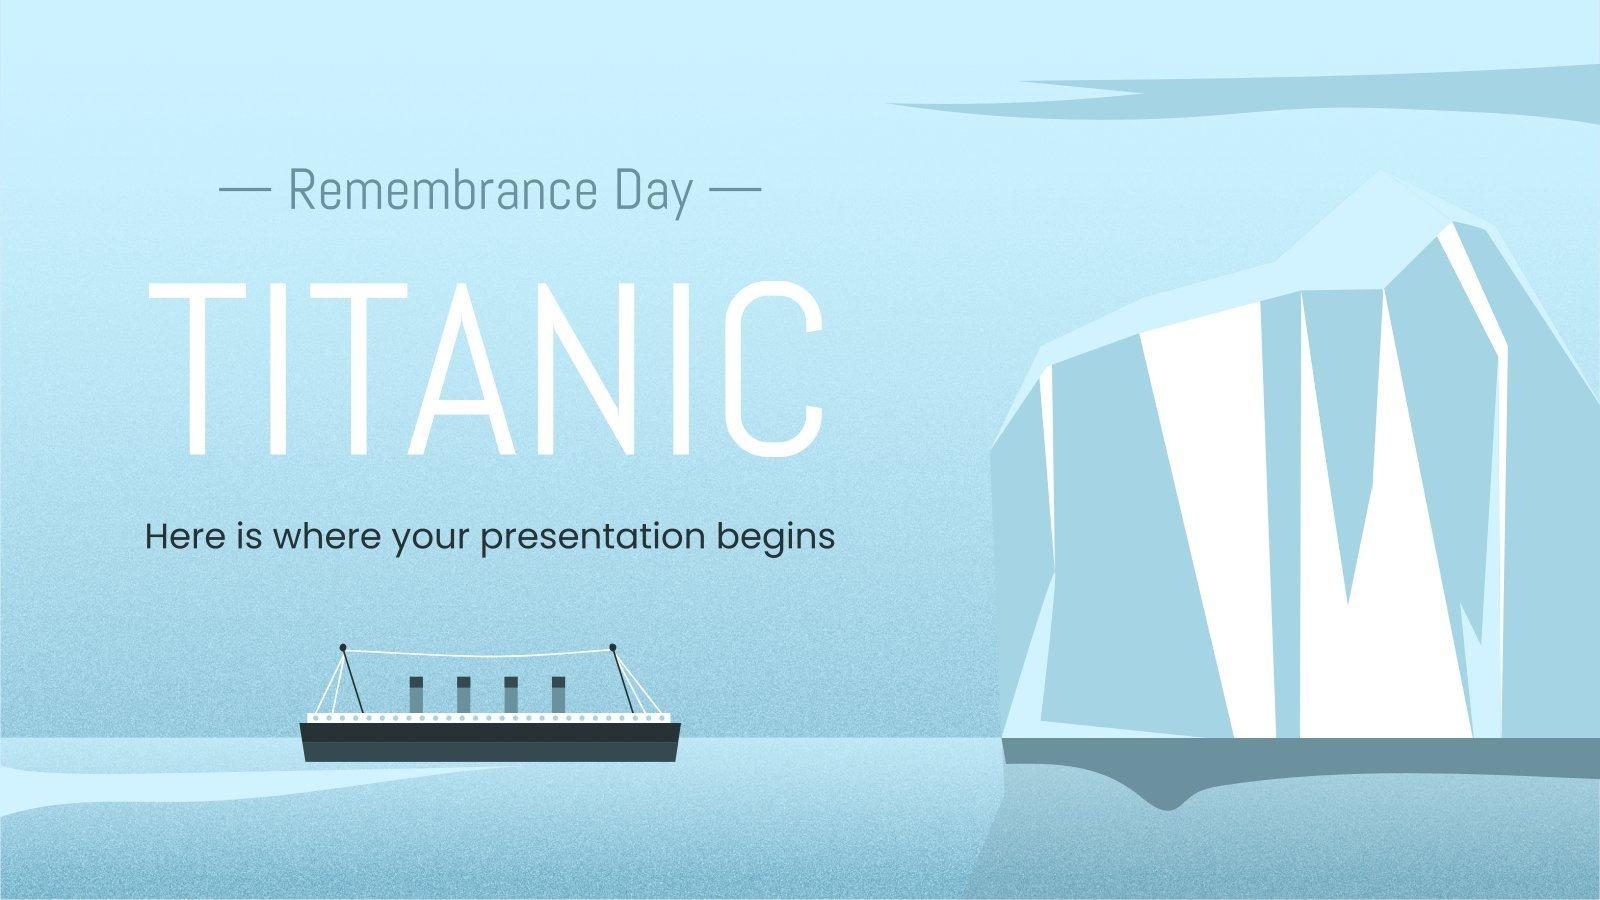 Titanic Remembrance Day presentation template